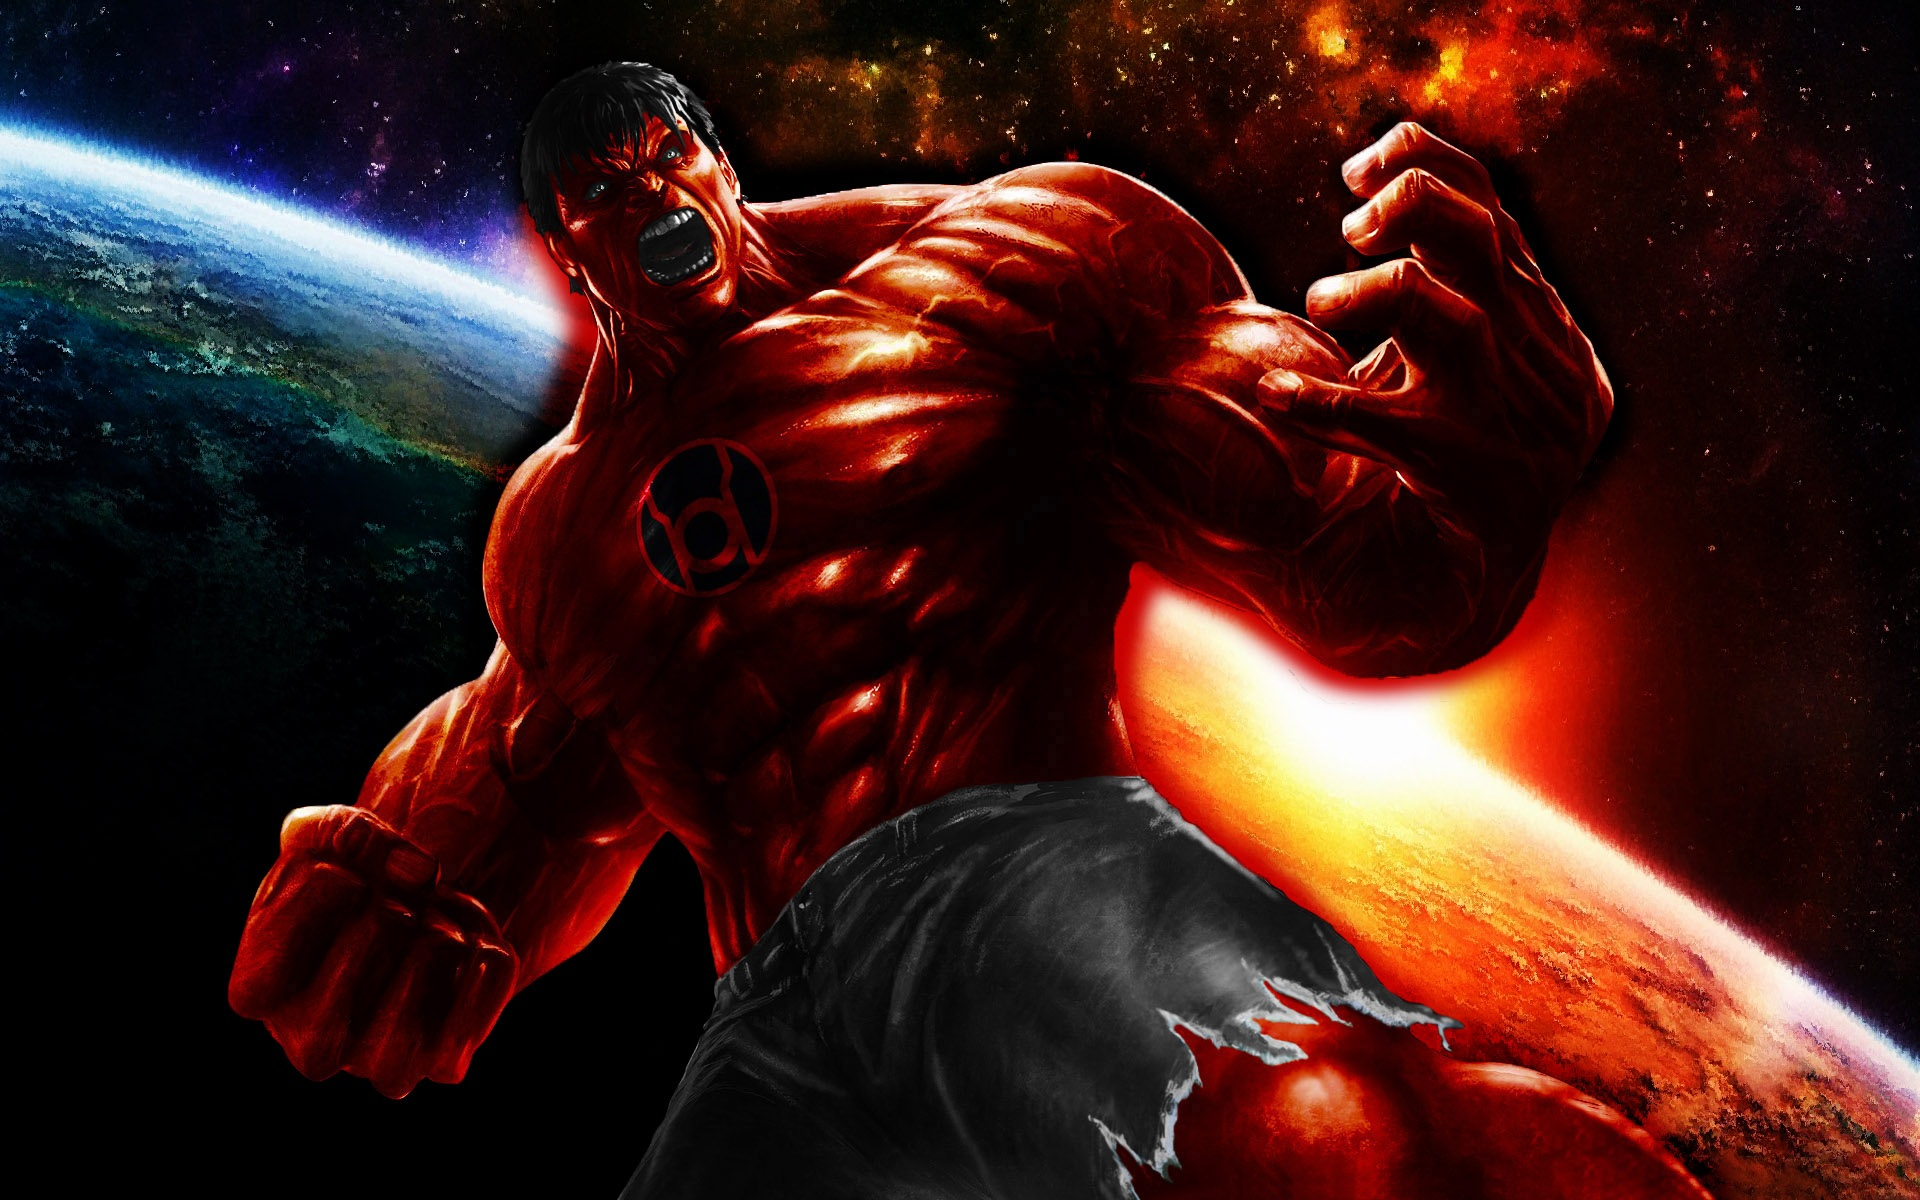 Red Lantern Hulk by 666Darks